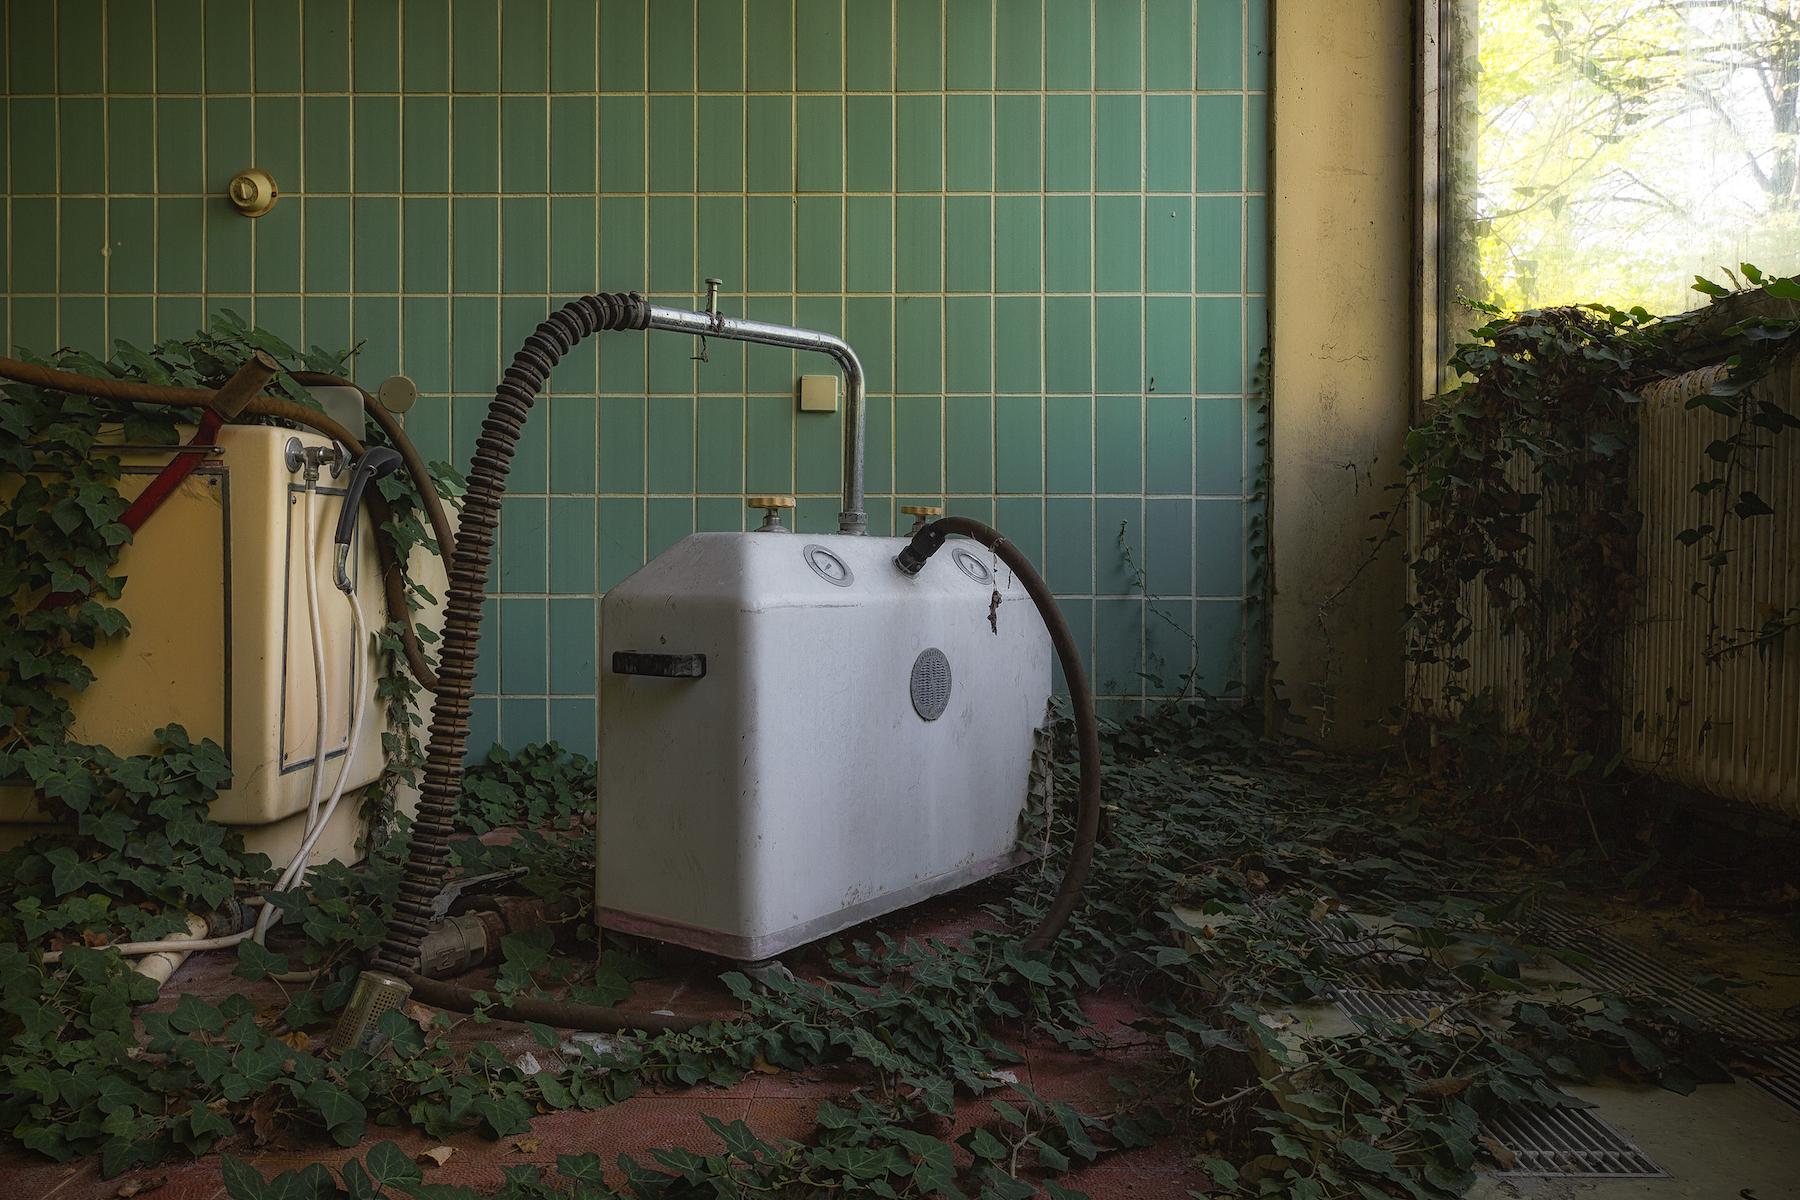 Naturaleza invadiendo lugares abandonados por Stefan Baumann